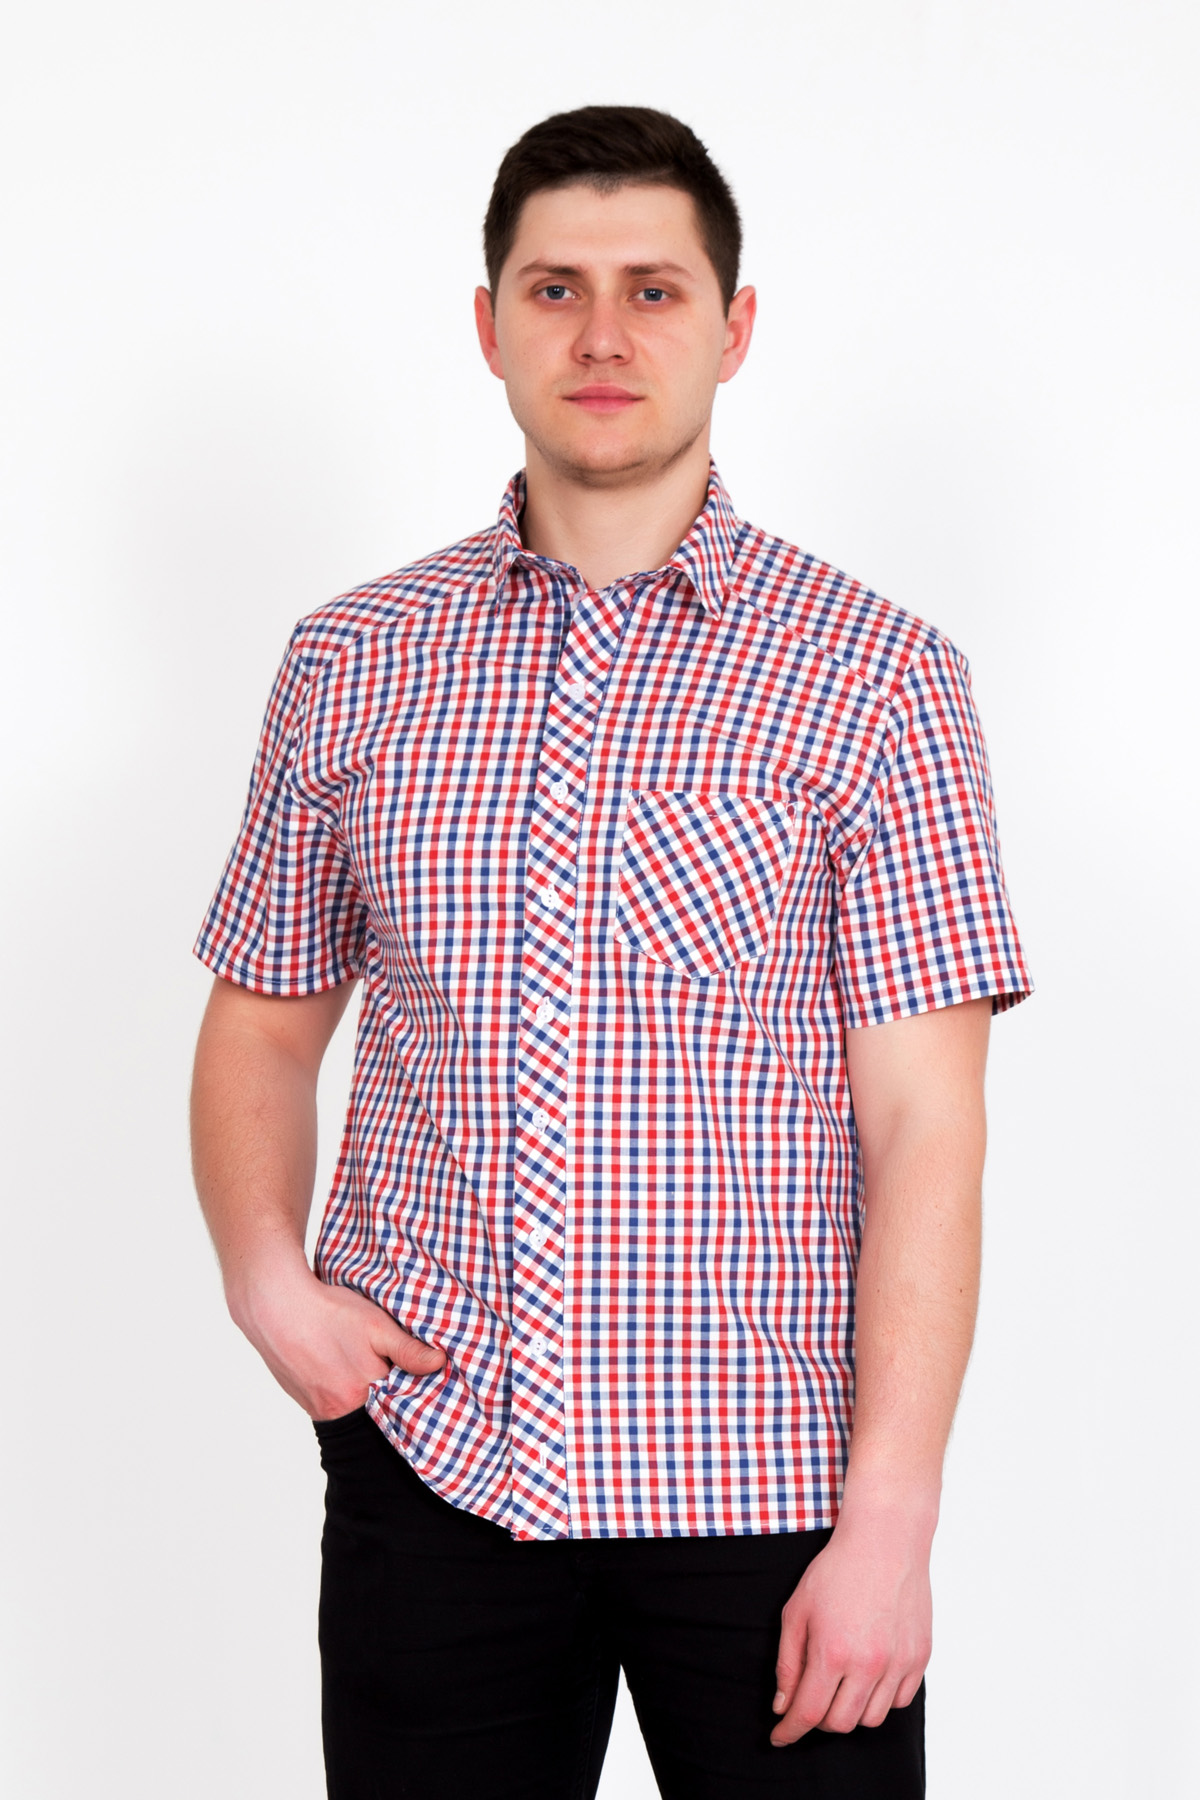 Муж. рубашка Оливер р. 56Рубашки<br>Обхват груди:112 см<br>Обхват талии:104 см<br>Обхват бедер:112 см<br>Длина по спинке:73 см<br>Рост:178-186 см<br><br>Тип: Муж. рубашка<br>Размер: 56<br>Материал: Сорочечная перкаль